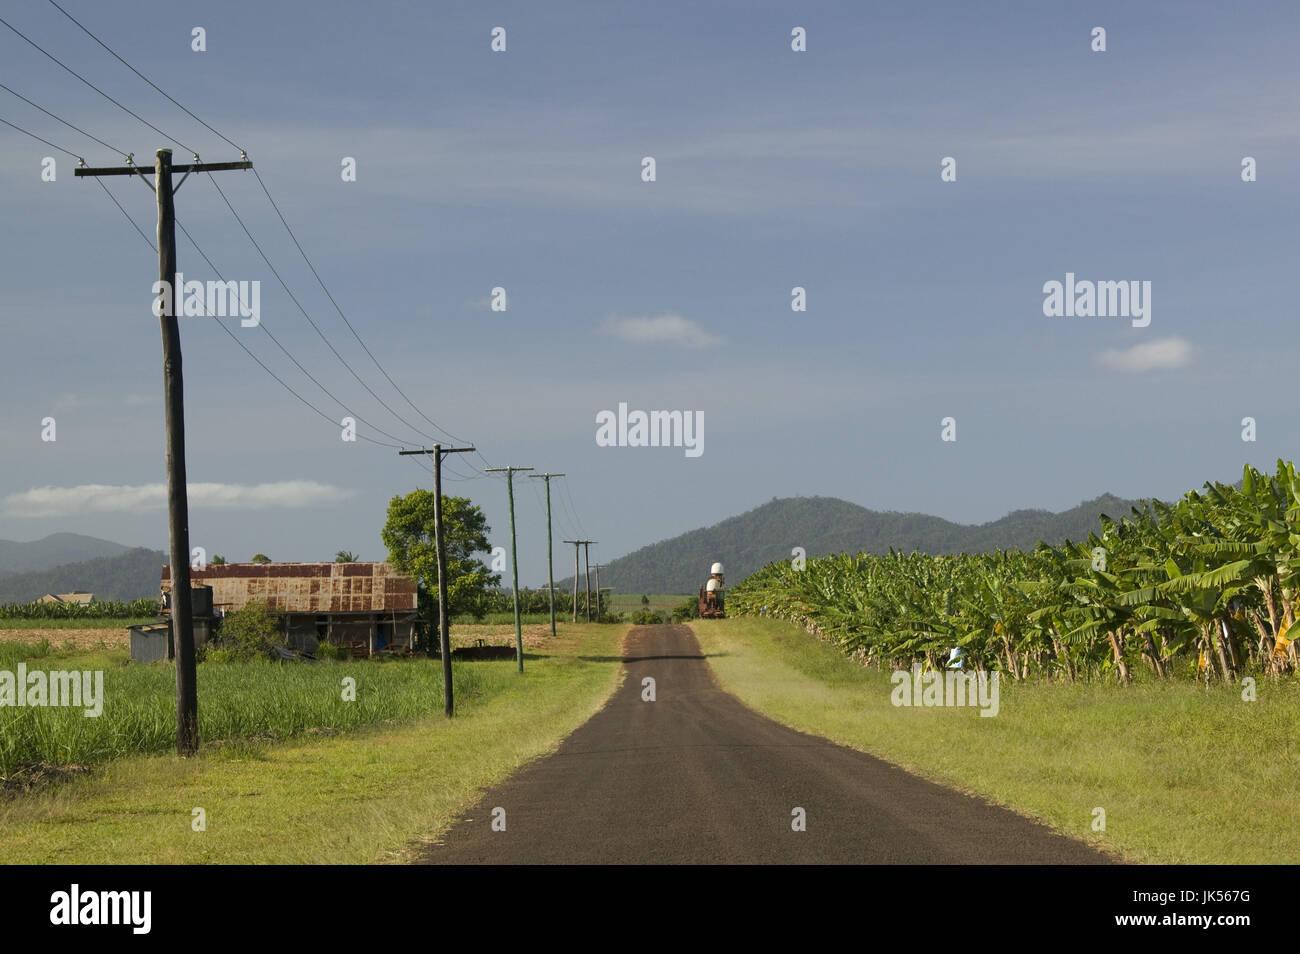 Australia, Queensland, North Coast, Babinda, Banana Road, Stock Photo